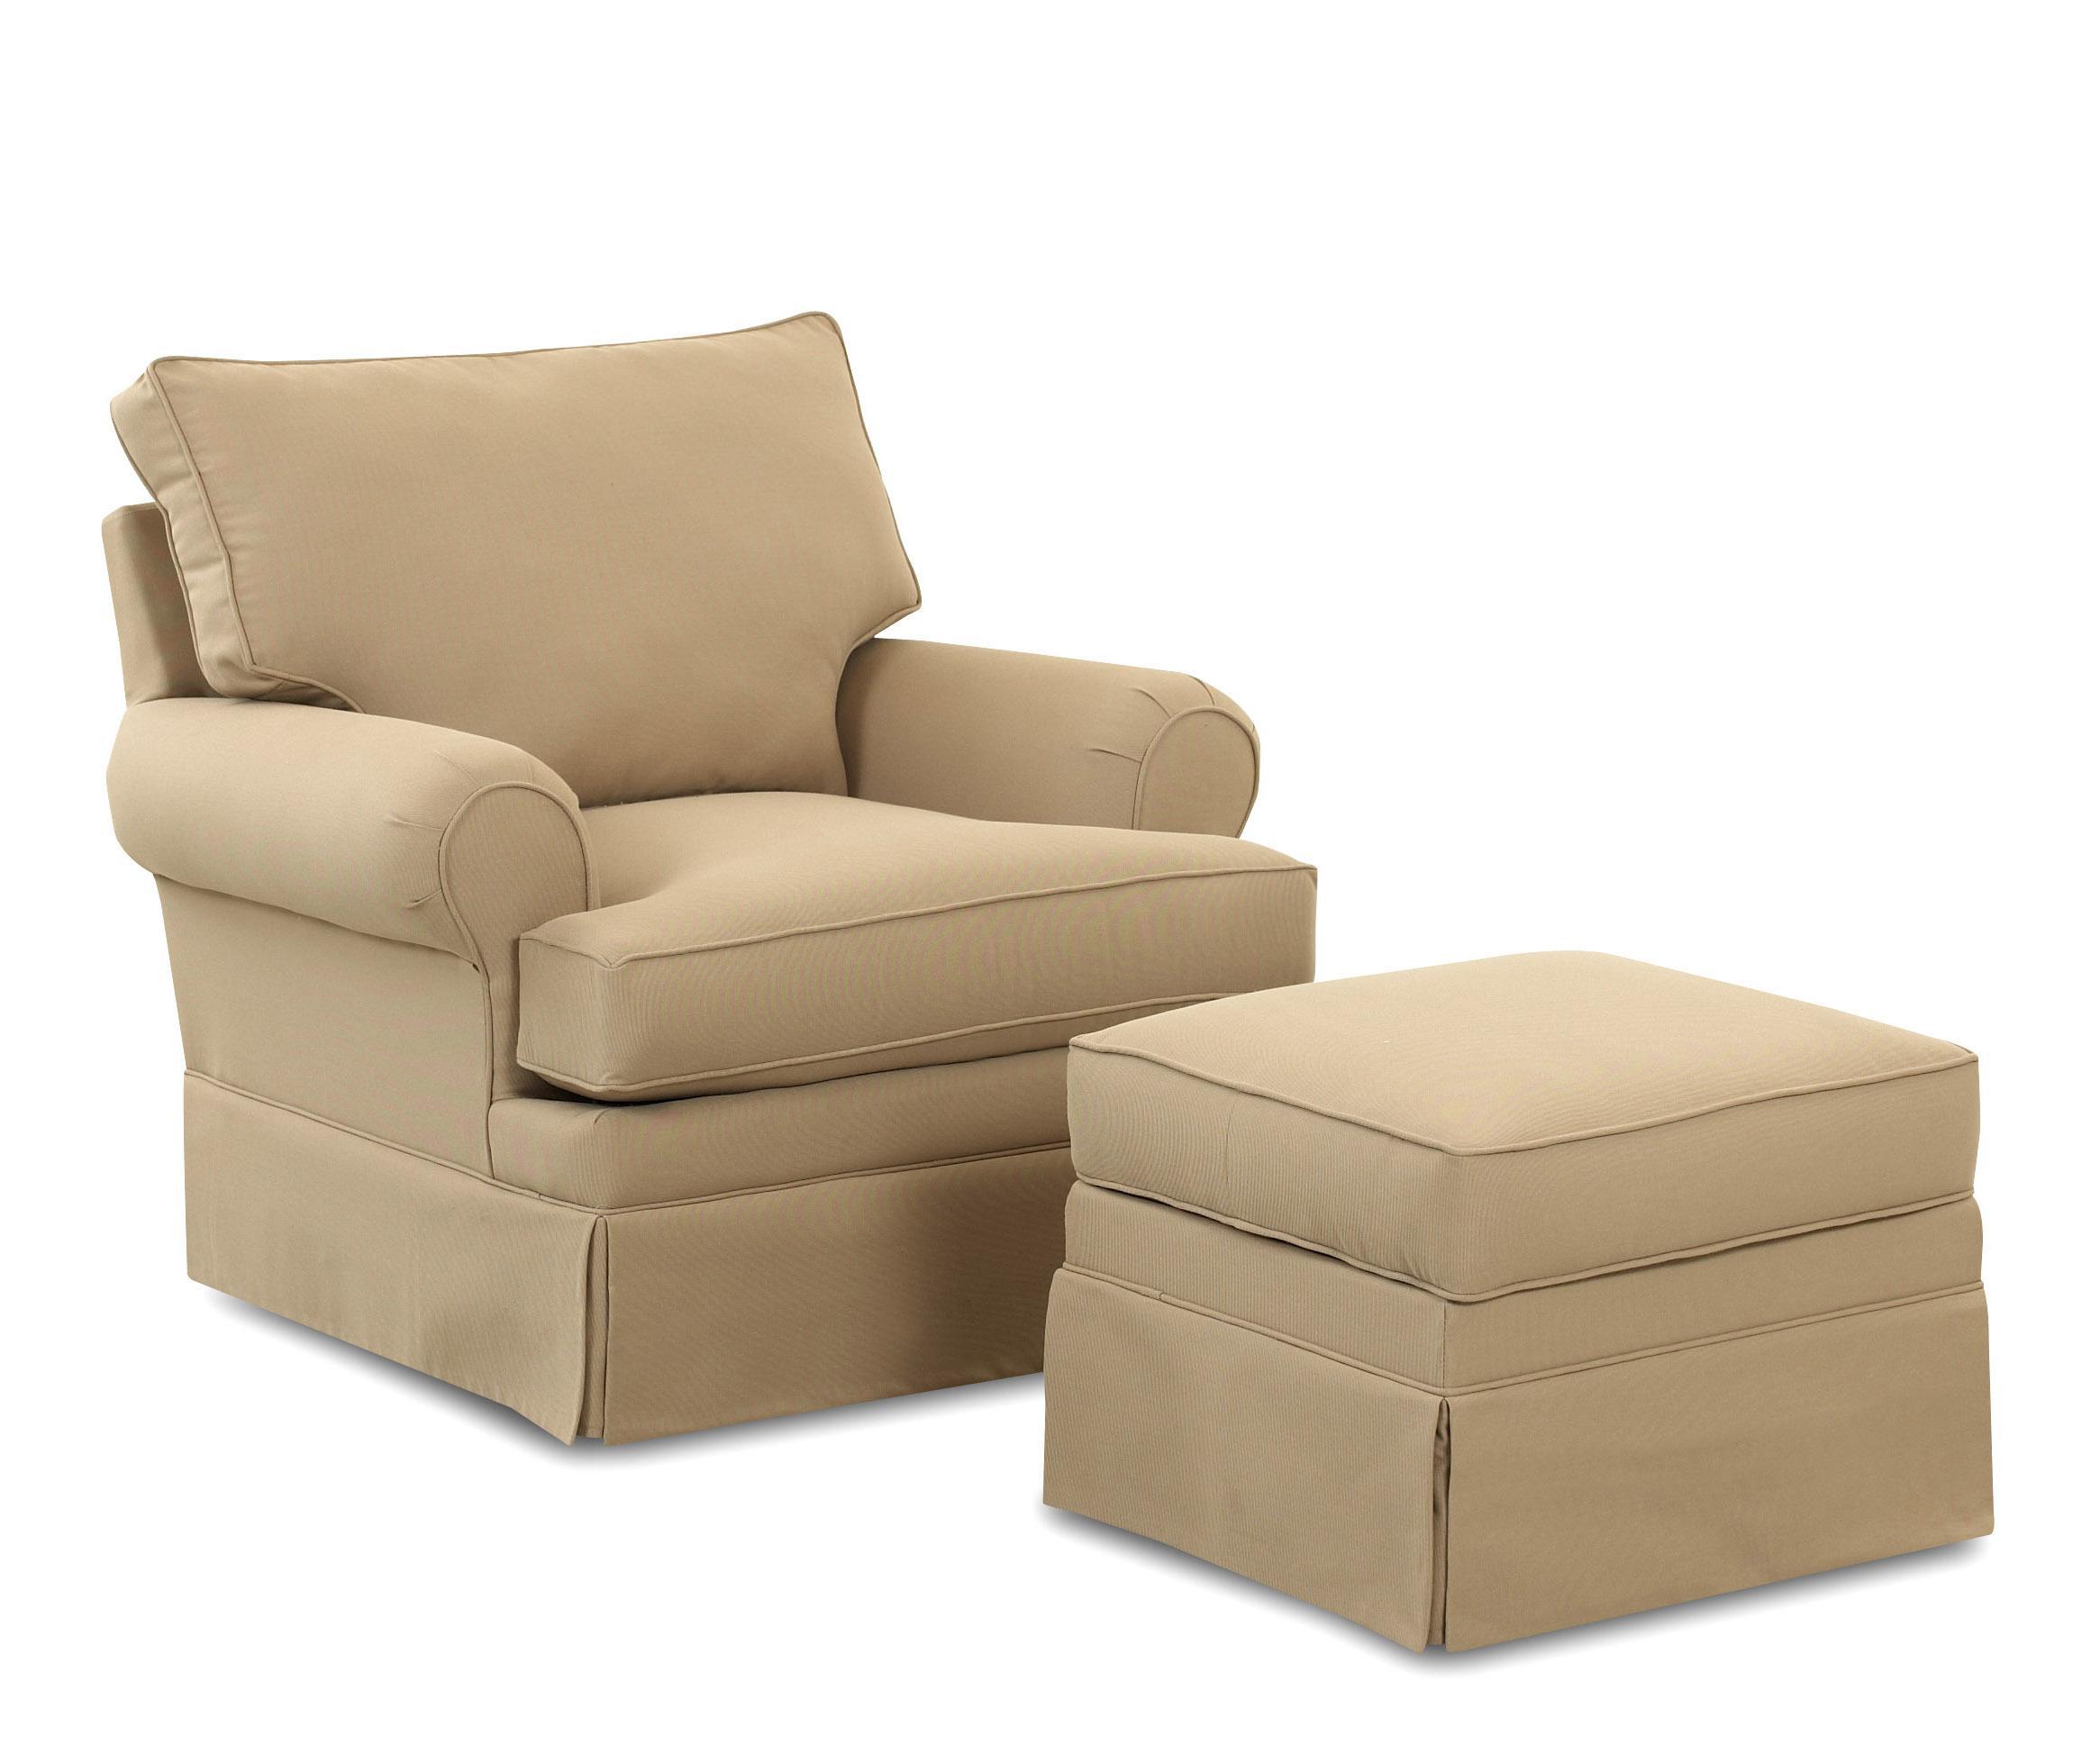 Carolina Glider Chair and Ottoman